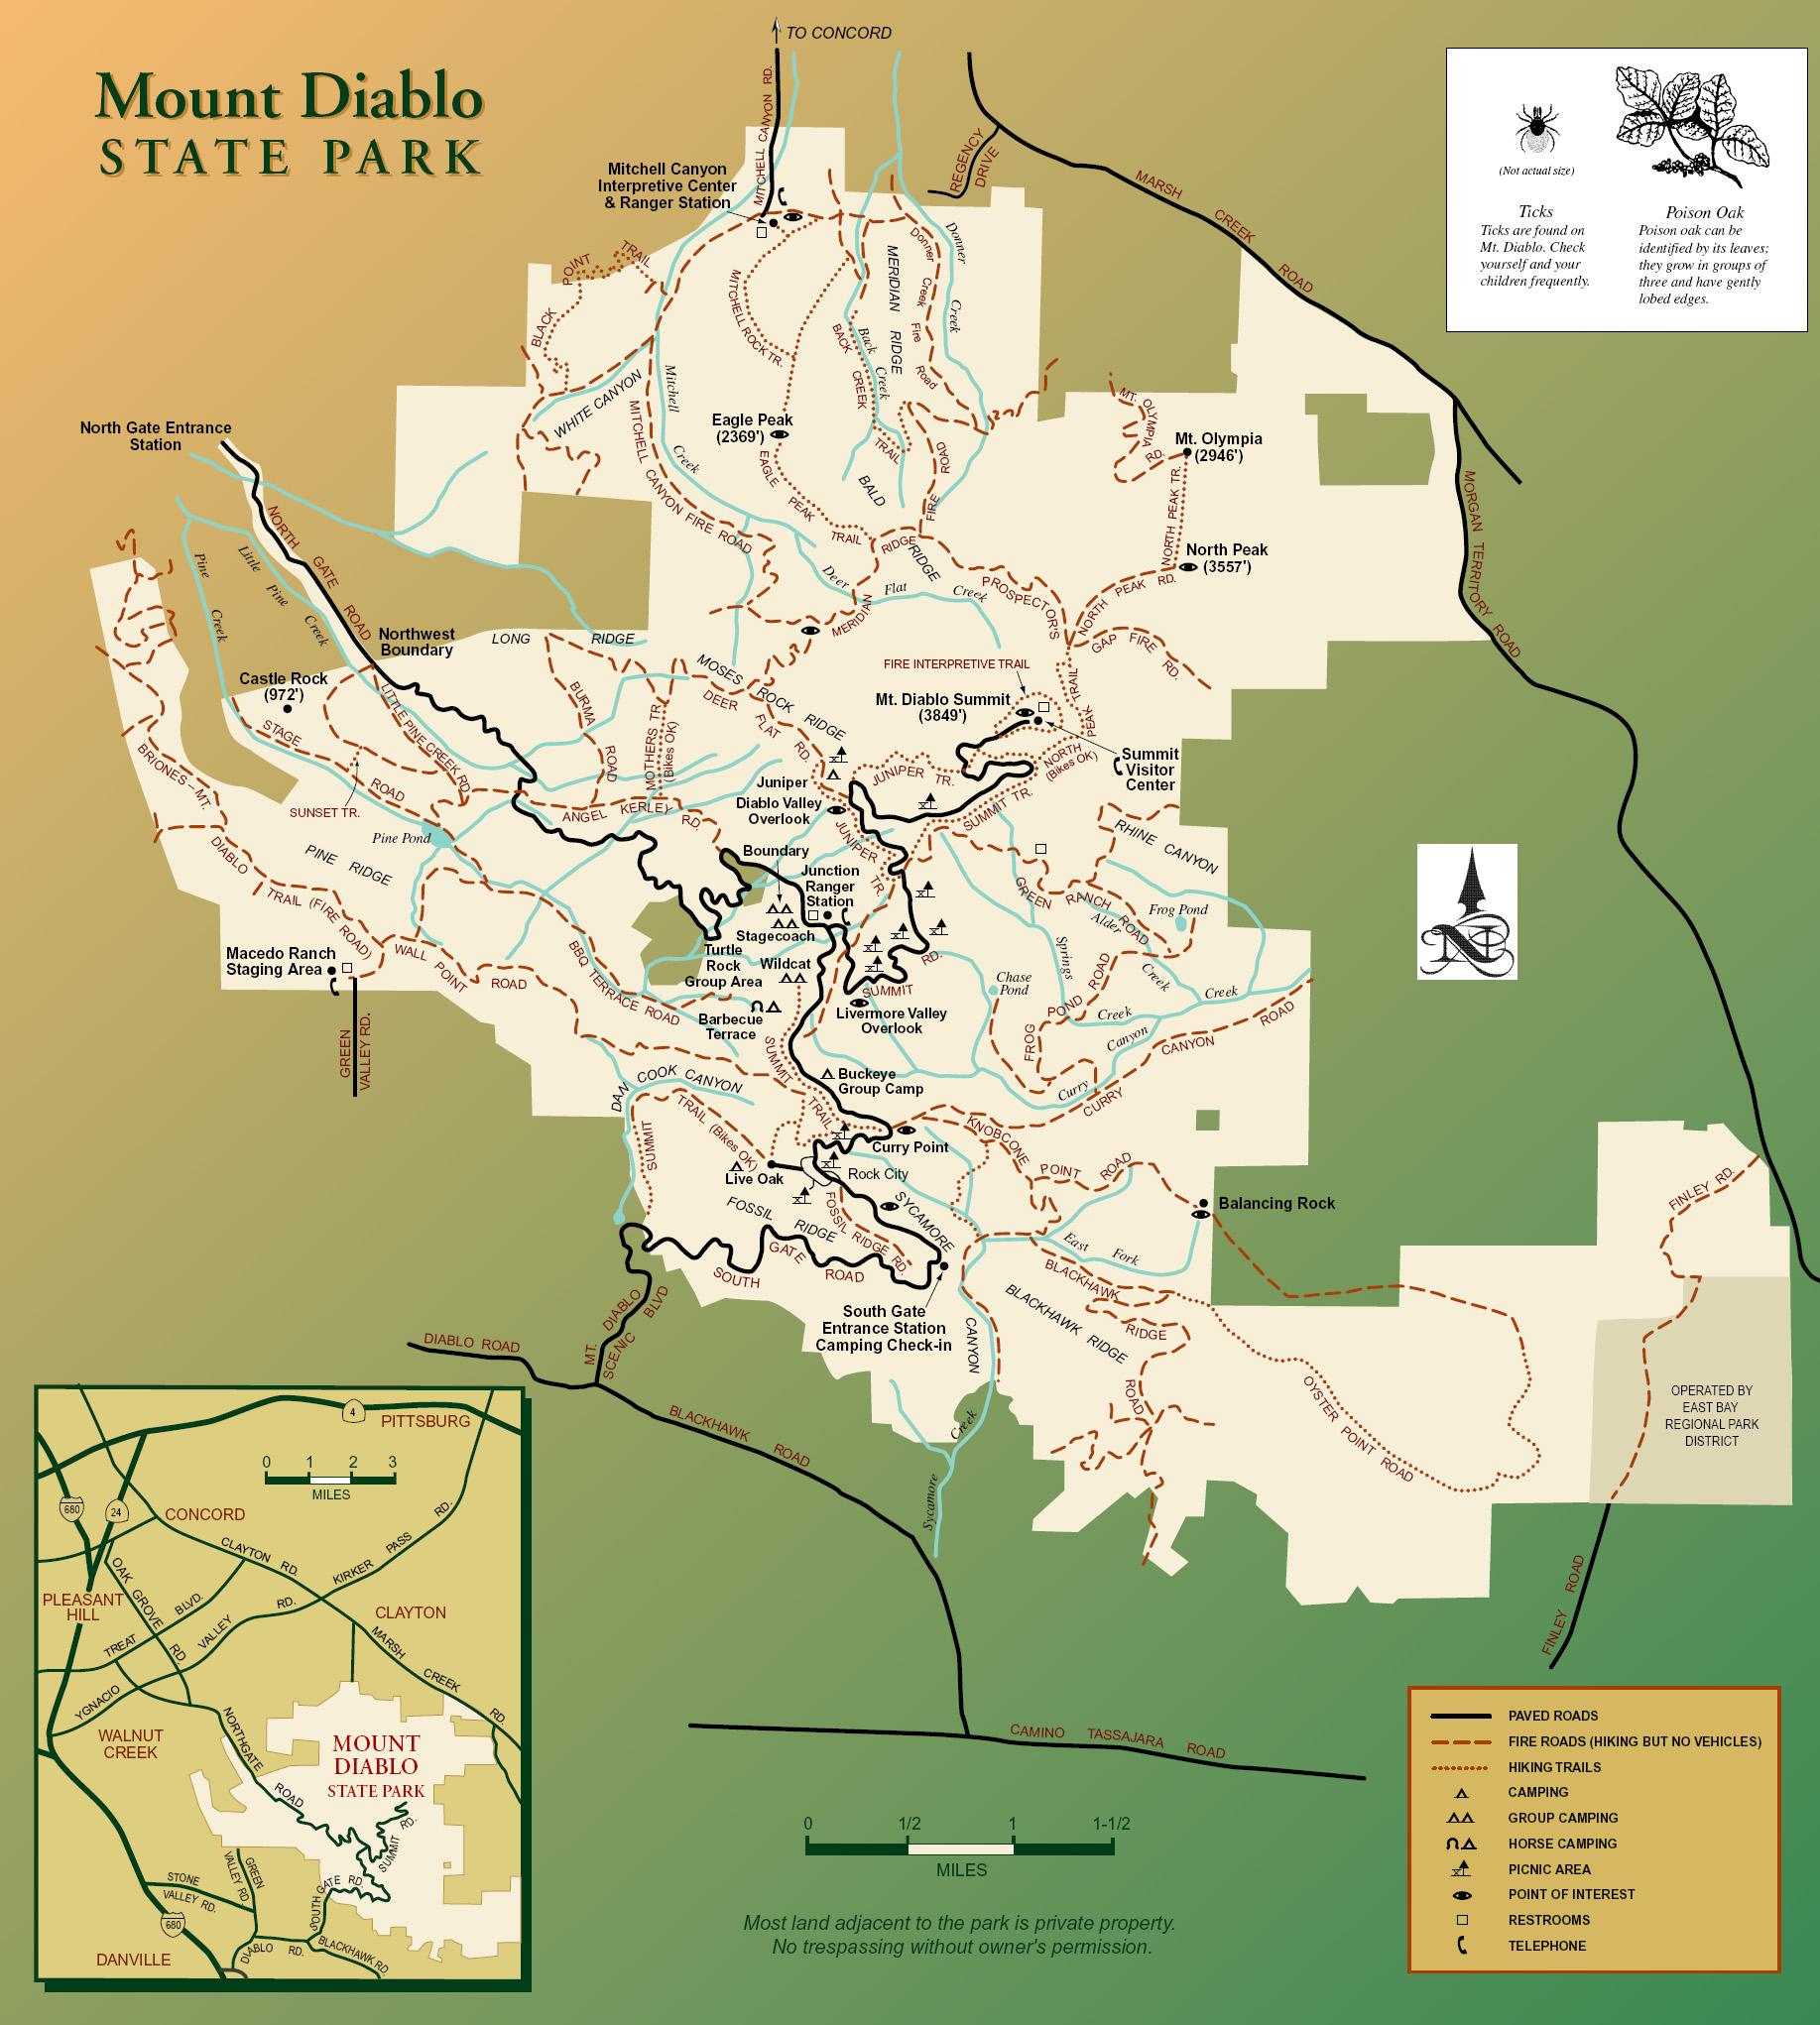 North Peak At Mt. Diablo State Park, Ca - Indi Nomads - Northern California State Parks Map